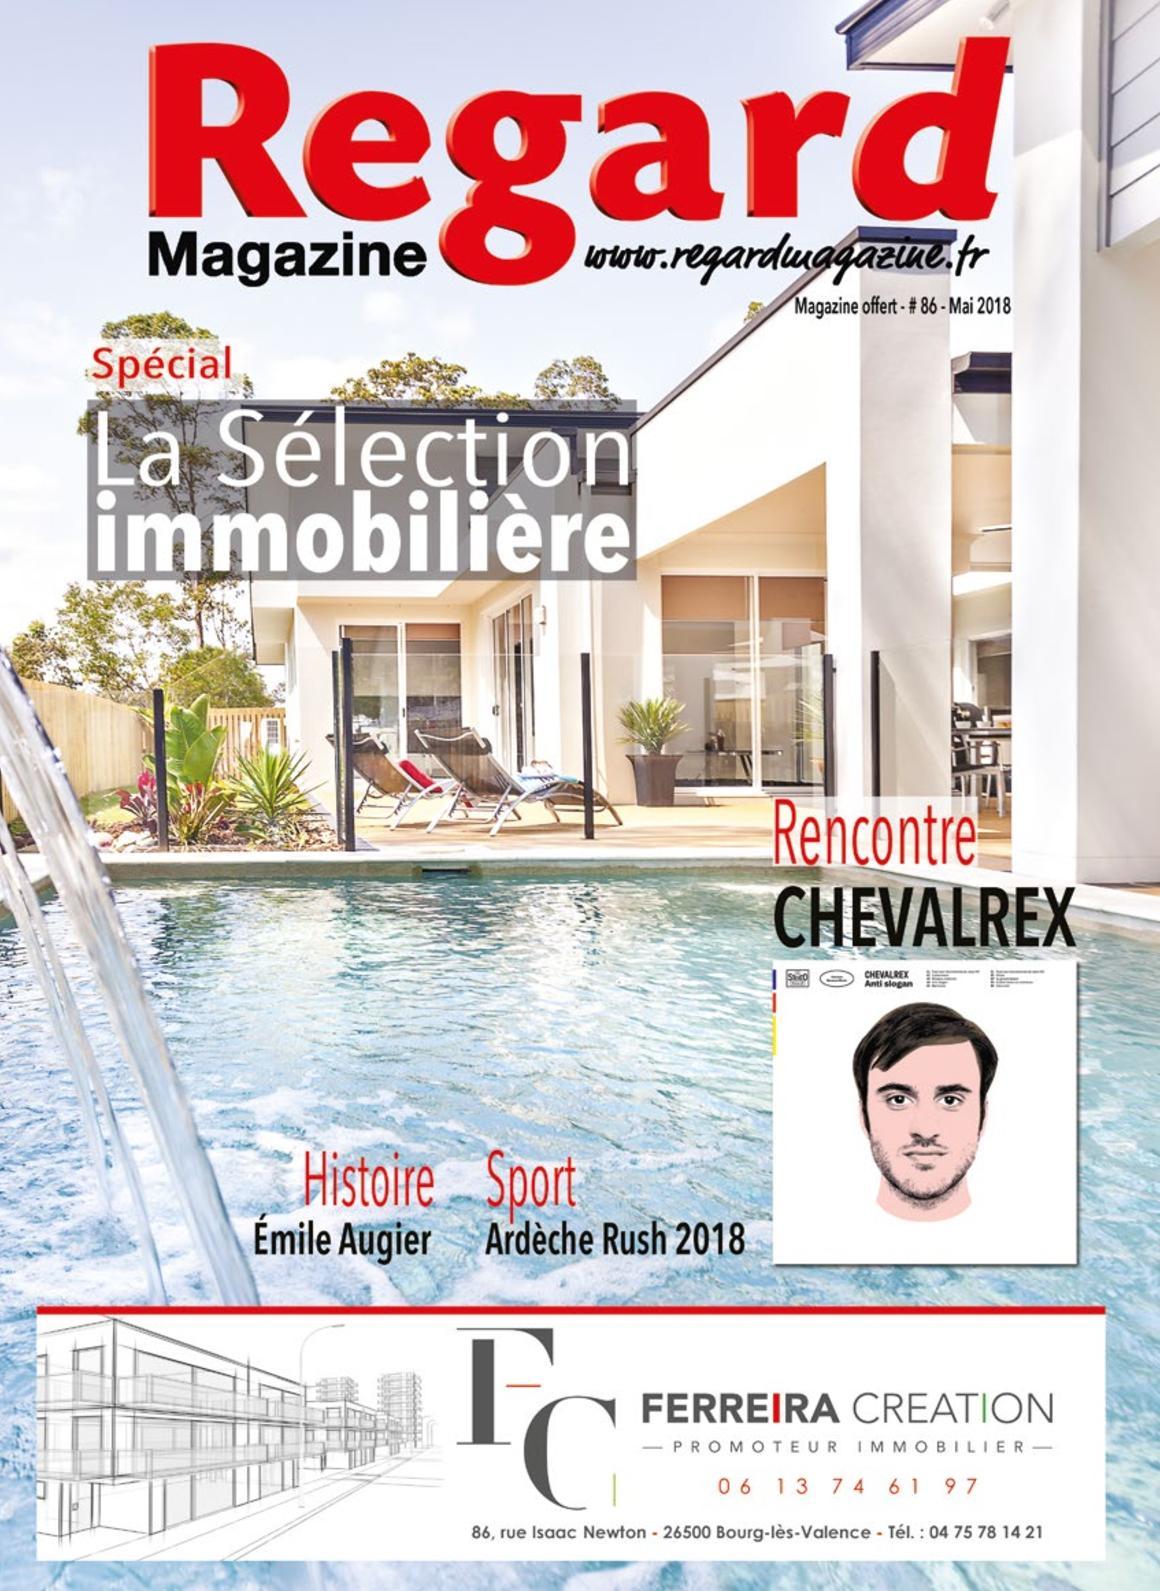 Regard Magazine #86 IMMOBILIER